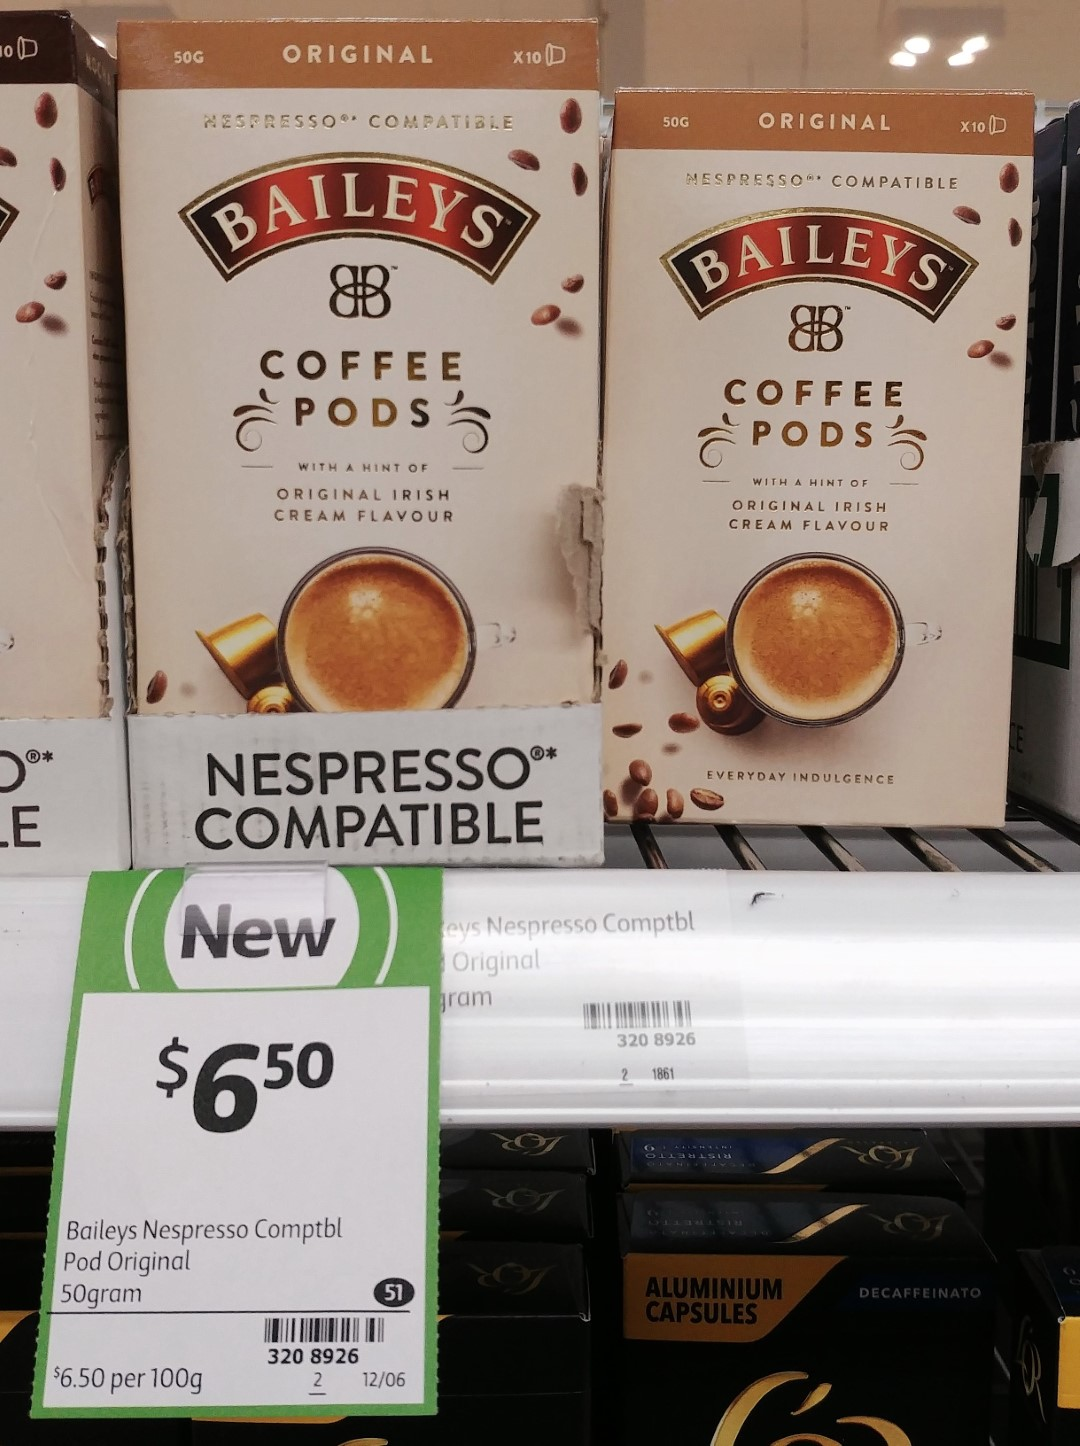 Baileys New Products Australia